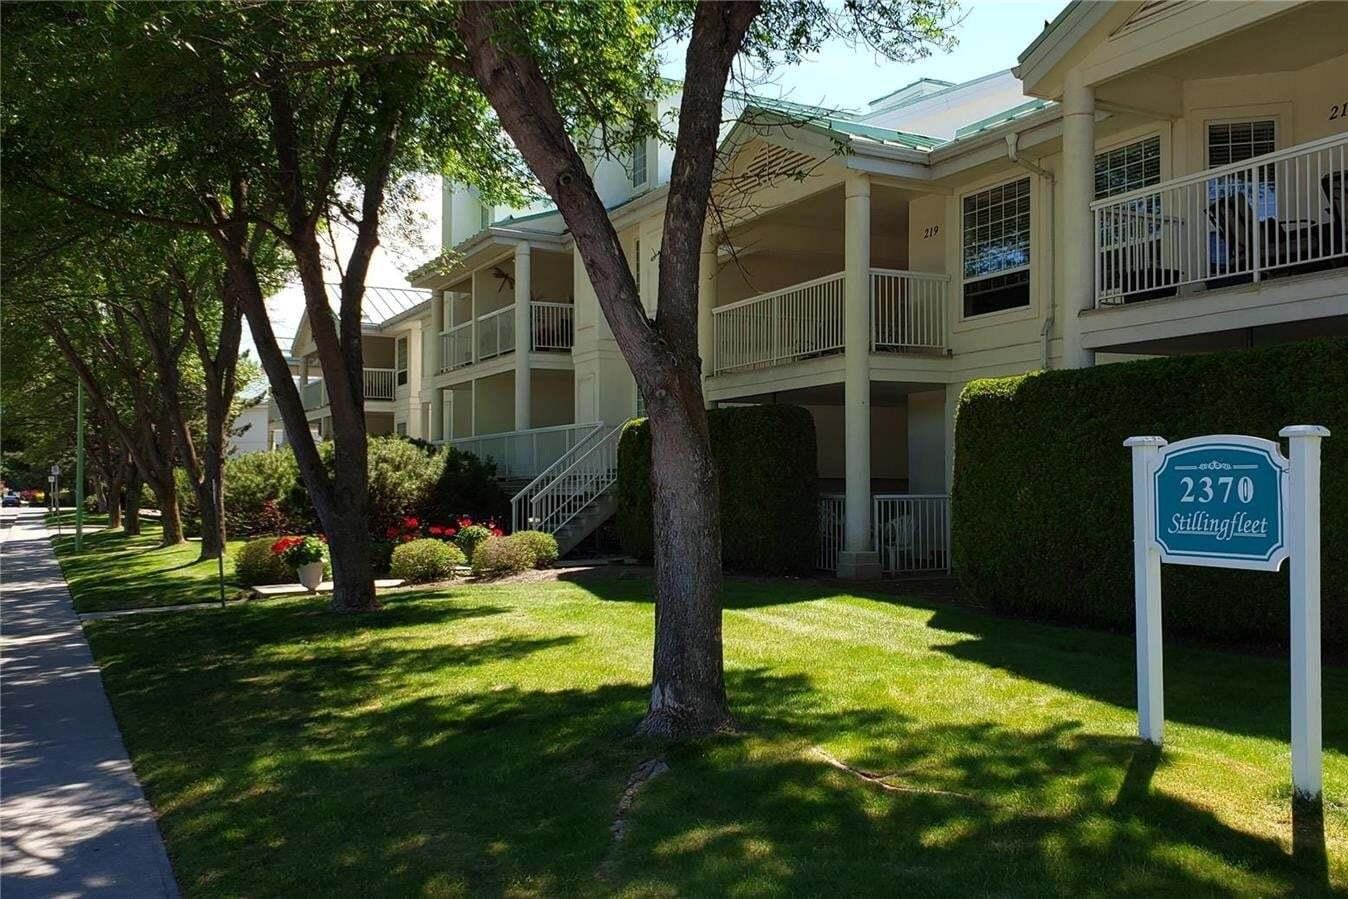 Townhouse for sale at 2370 Stillingfleet Rd Kelowna British Columbia - MLS: 10207259